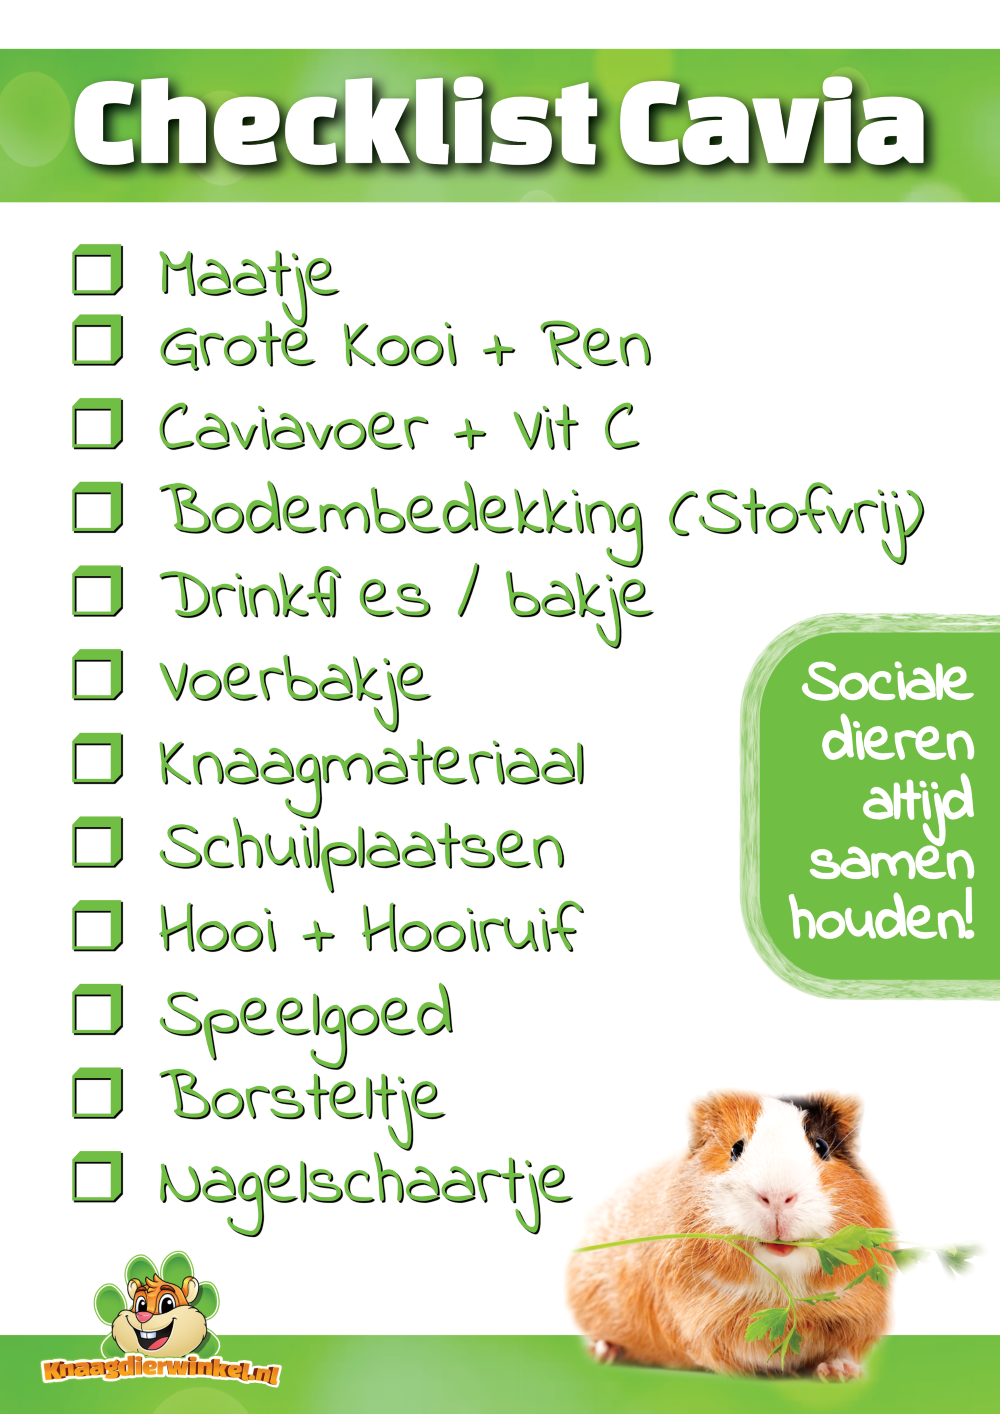 checklist cavia